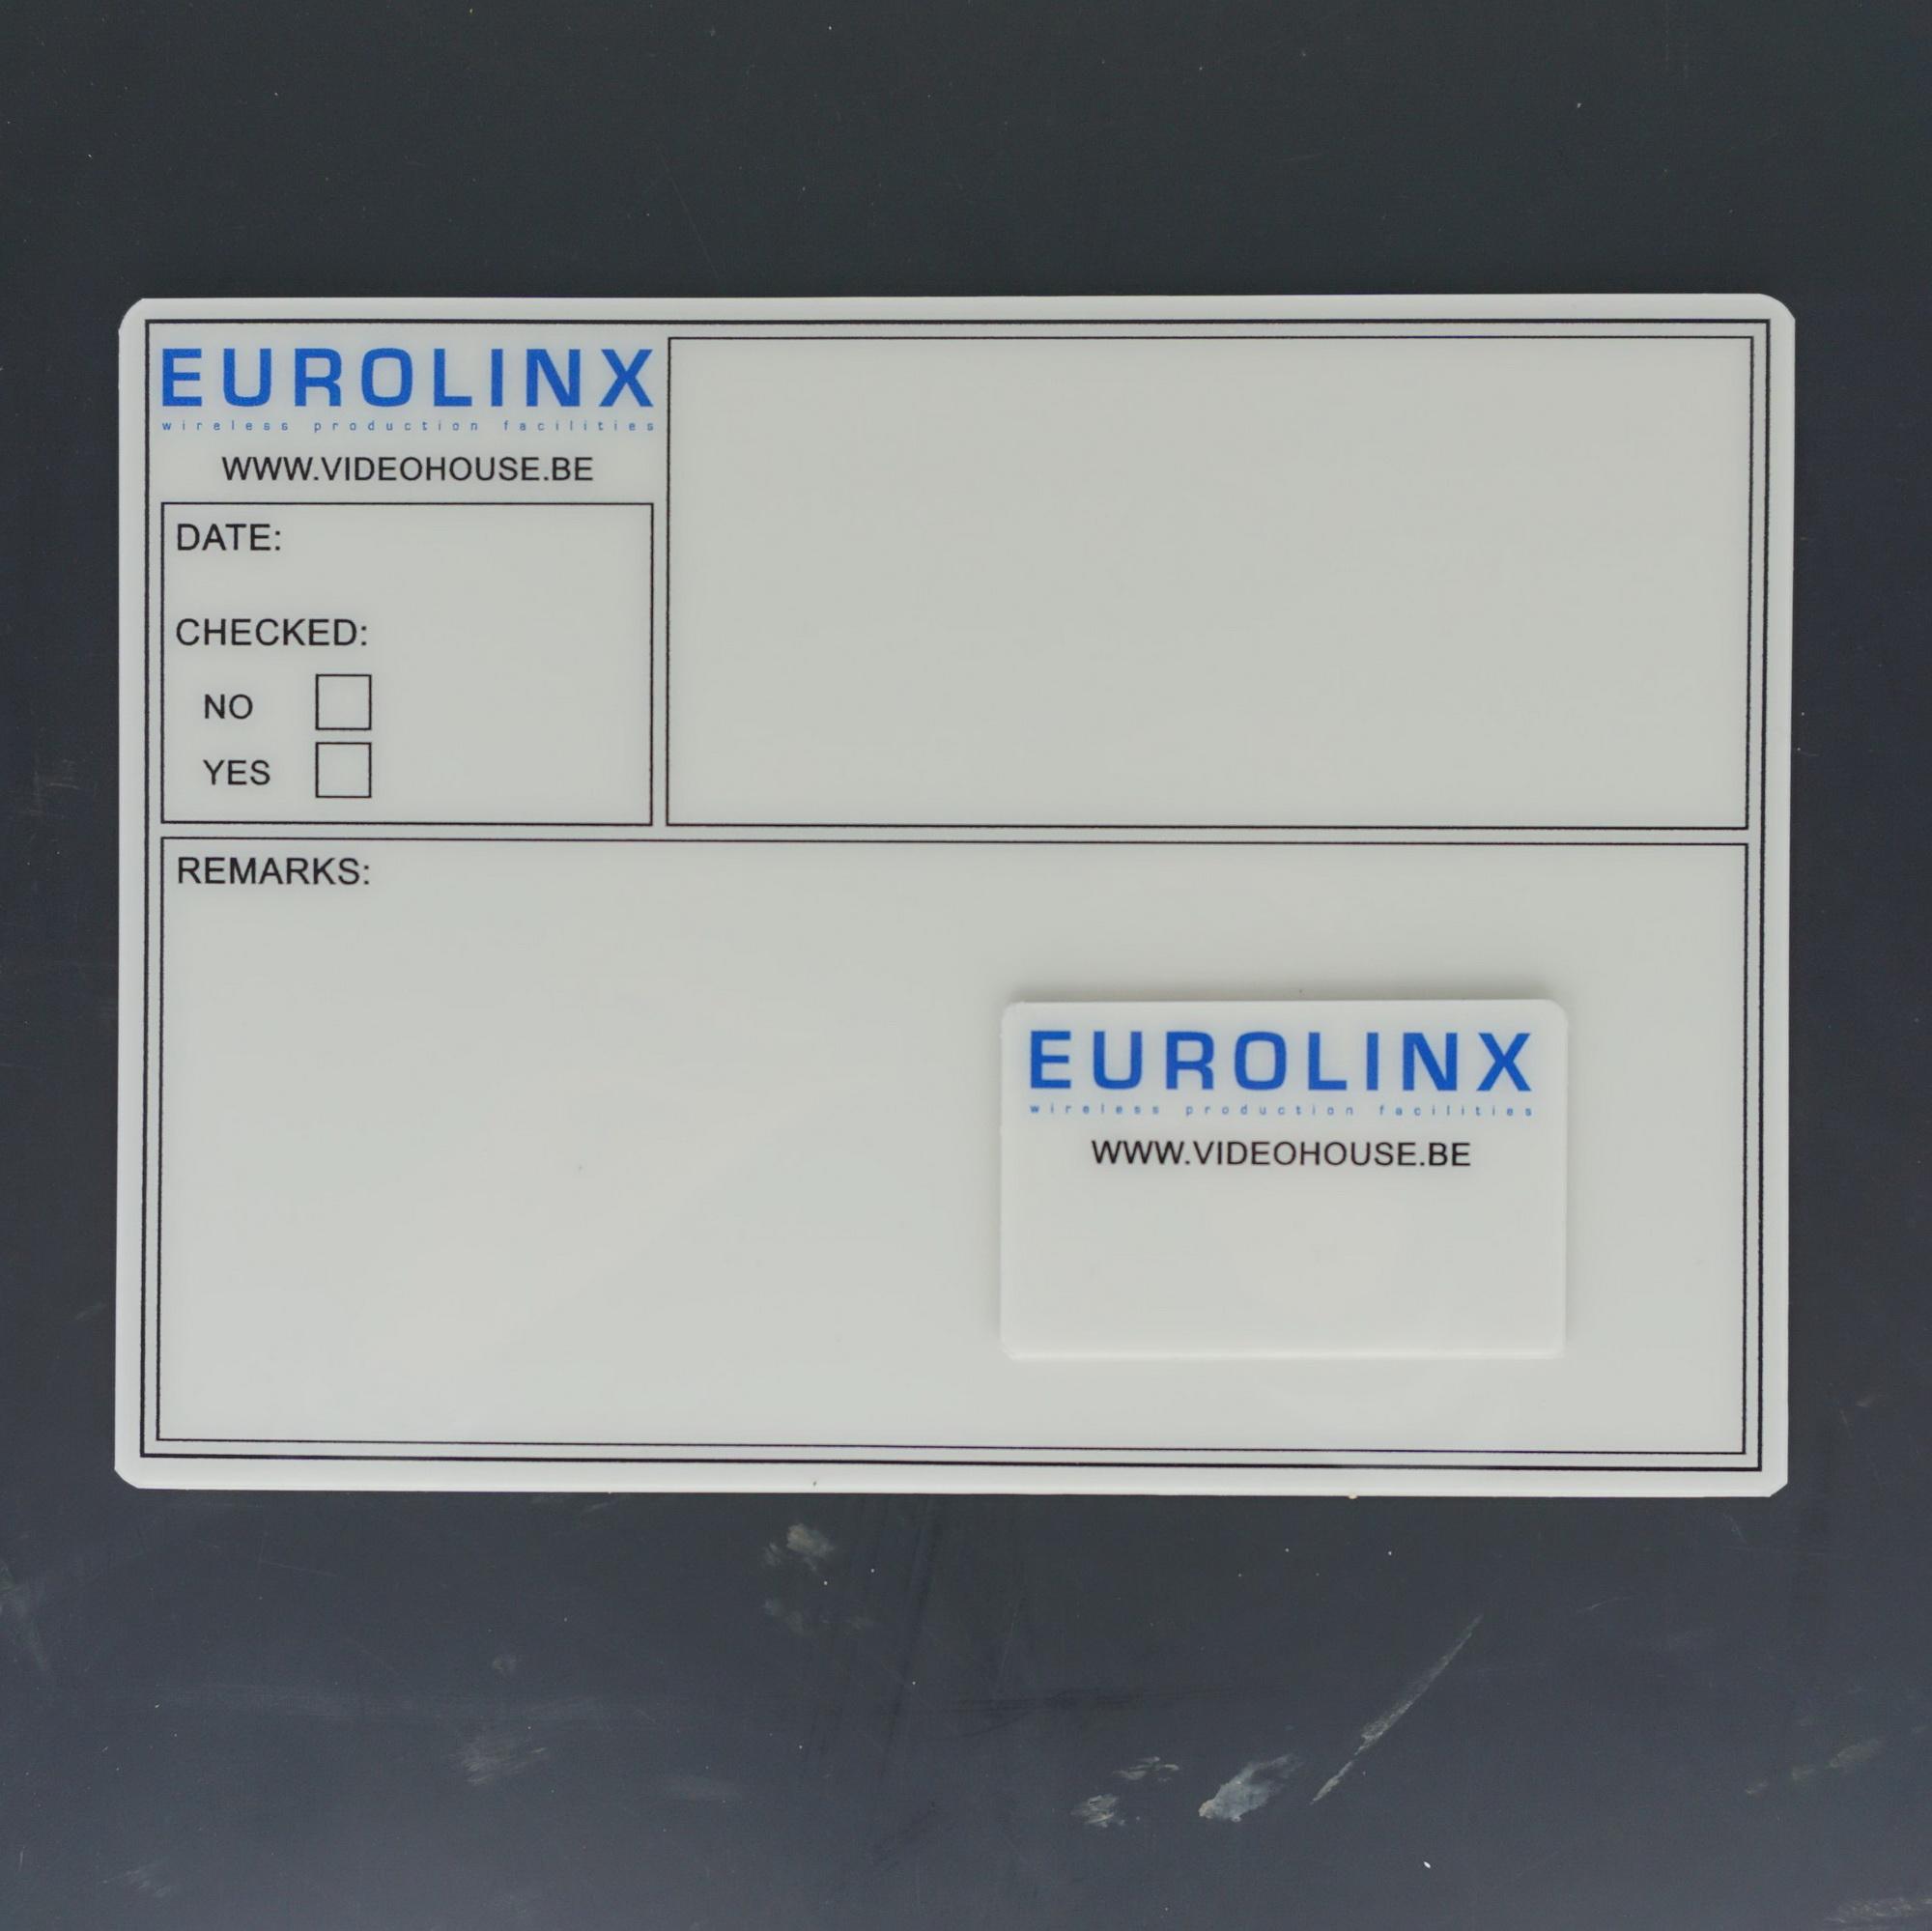 Flightcaselabels Caselabels Eurolynx